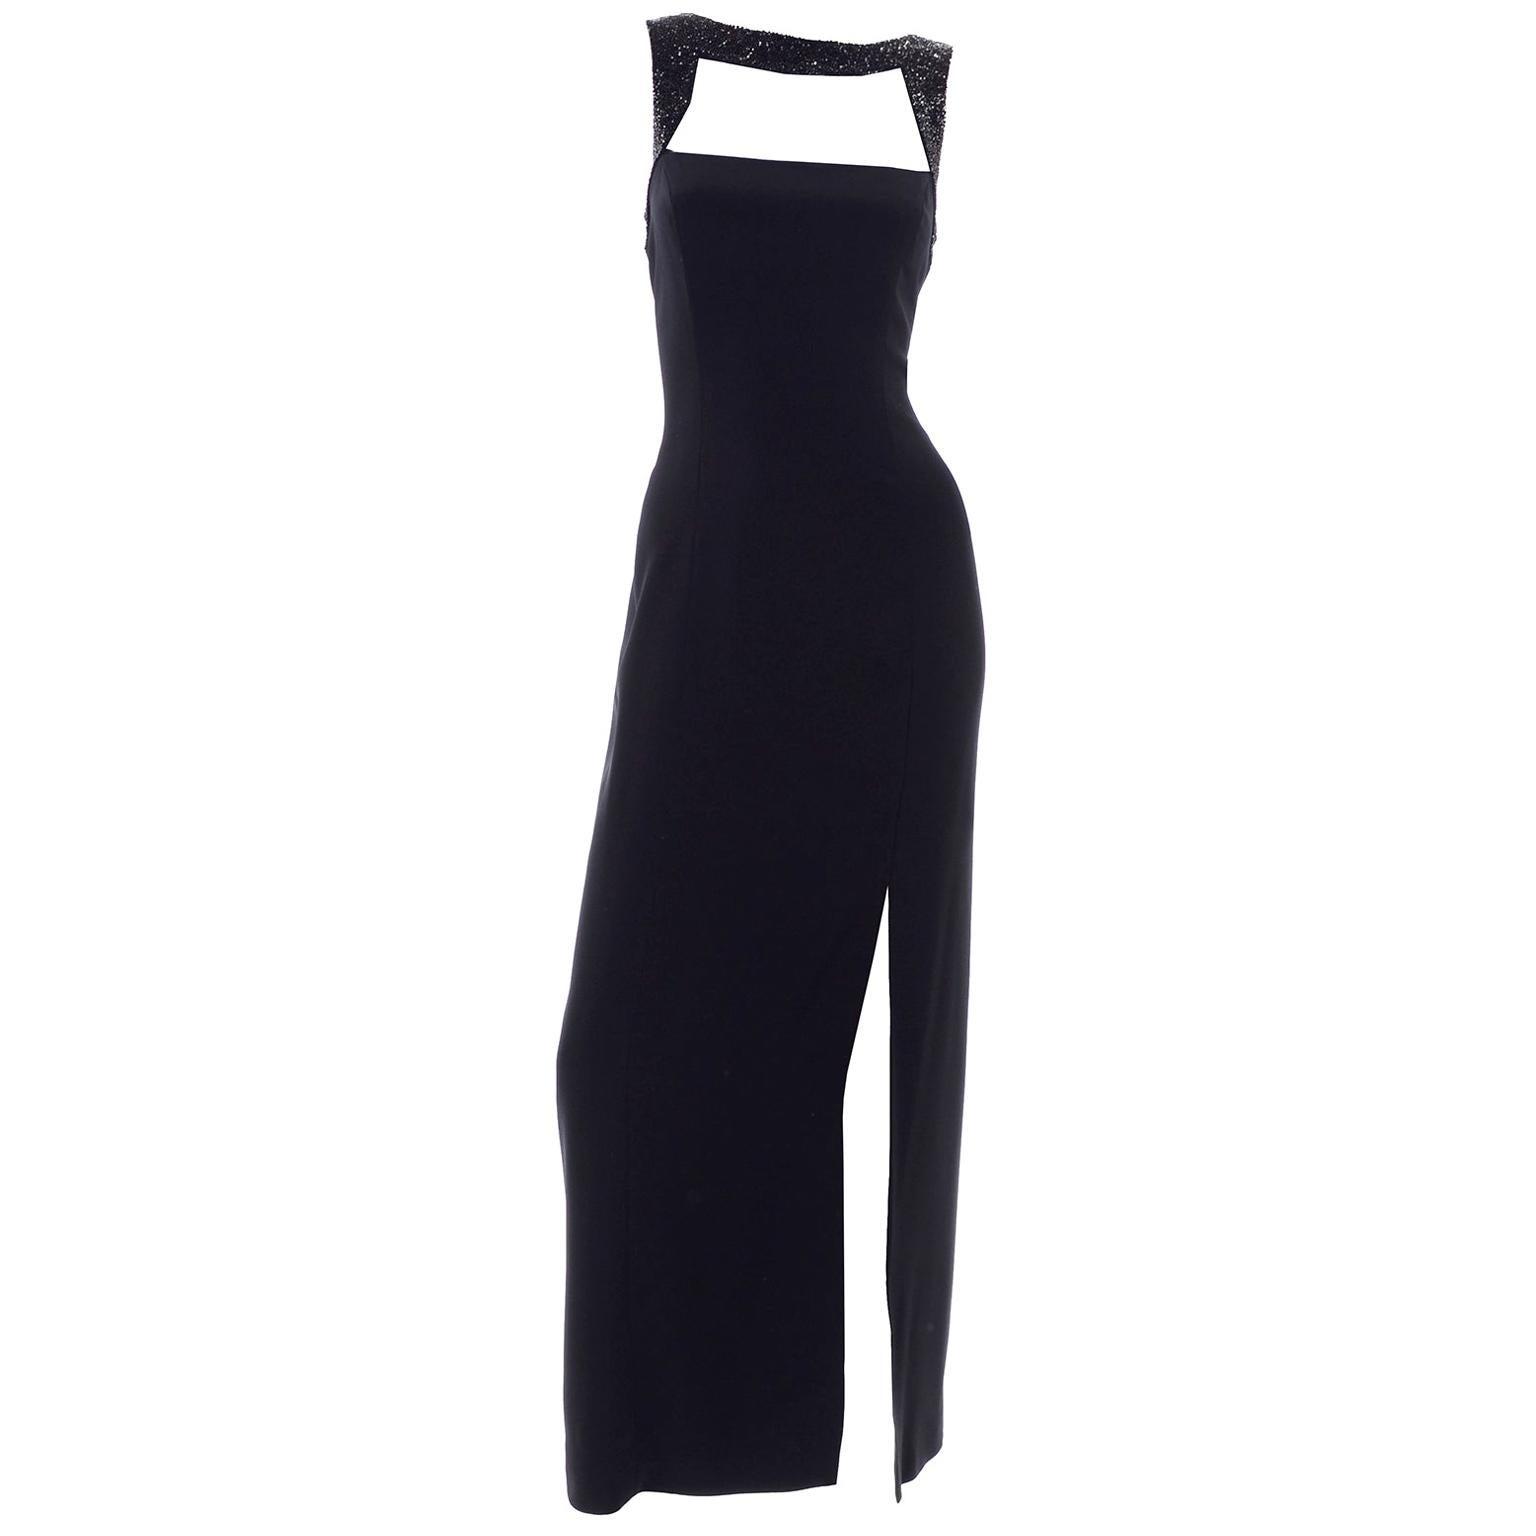 Vintage Oleg Cassini Black Tie Long Beaded Evening Dress With Cutwork Bodice